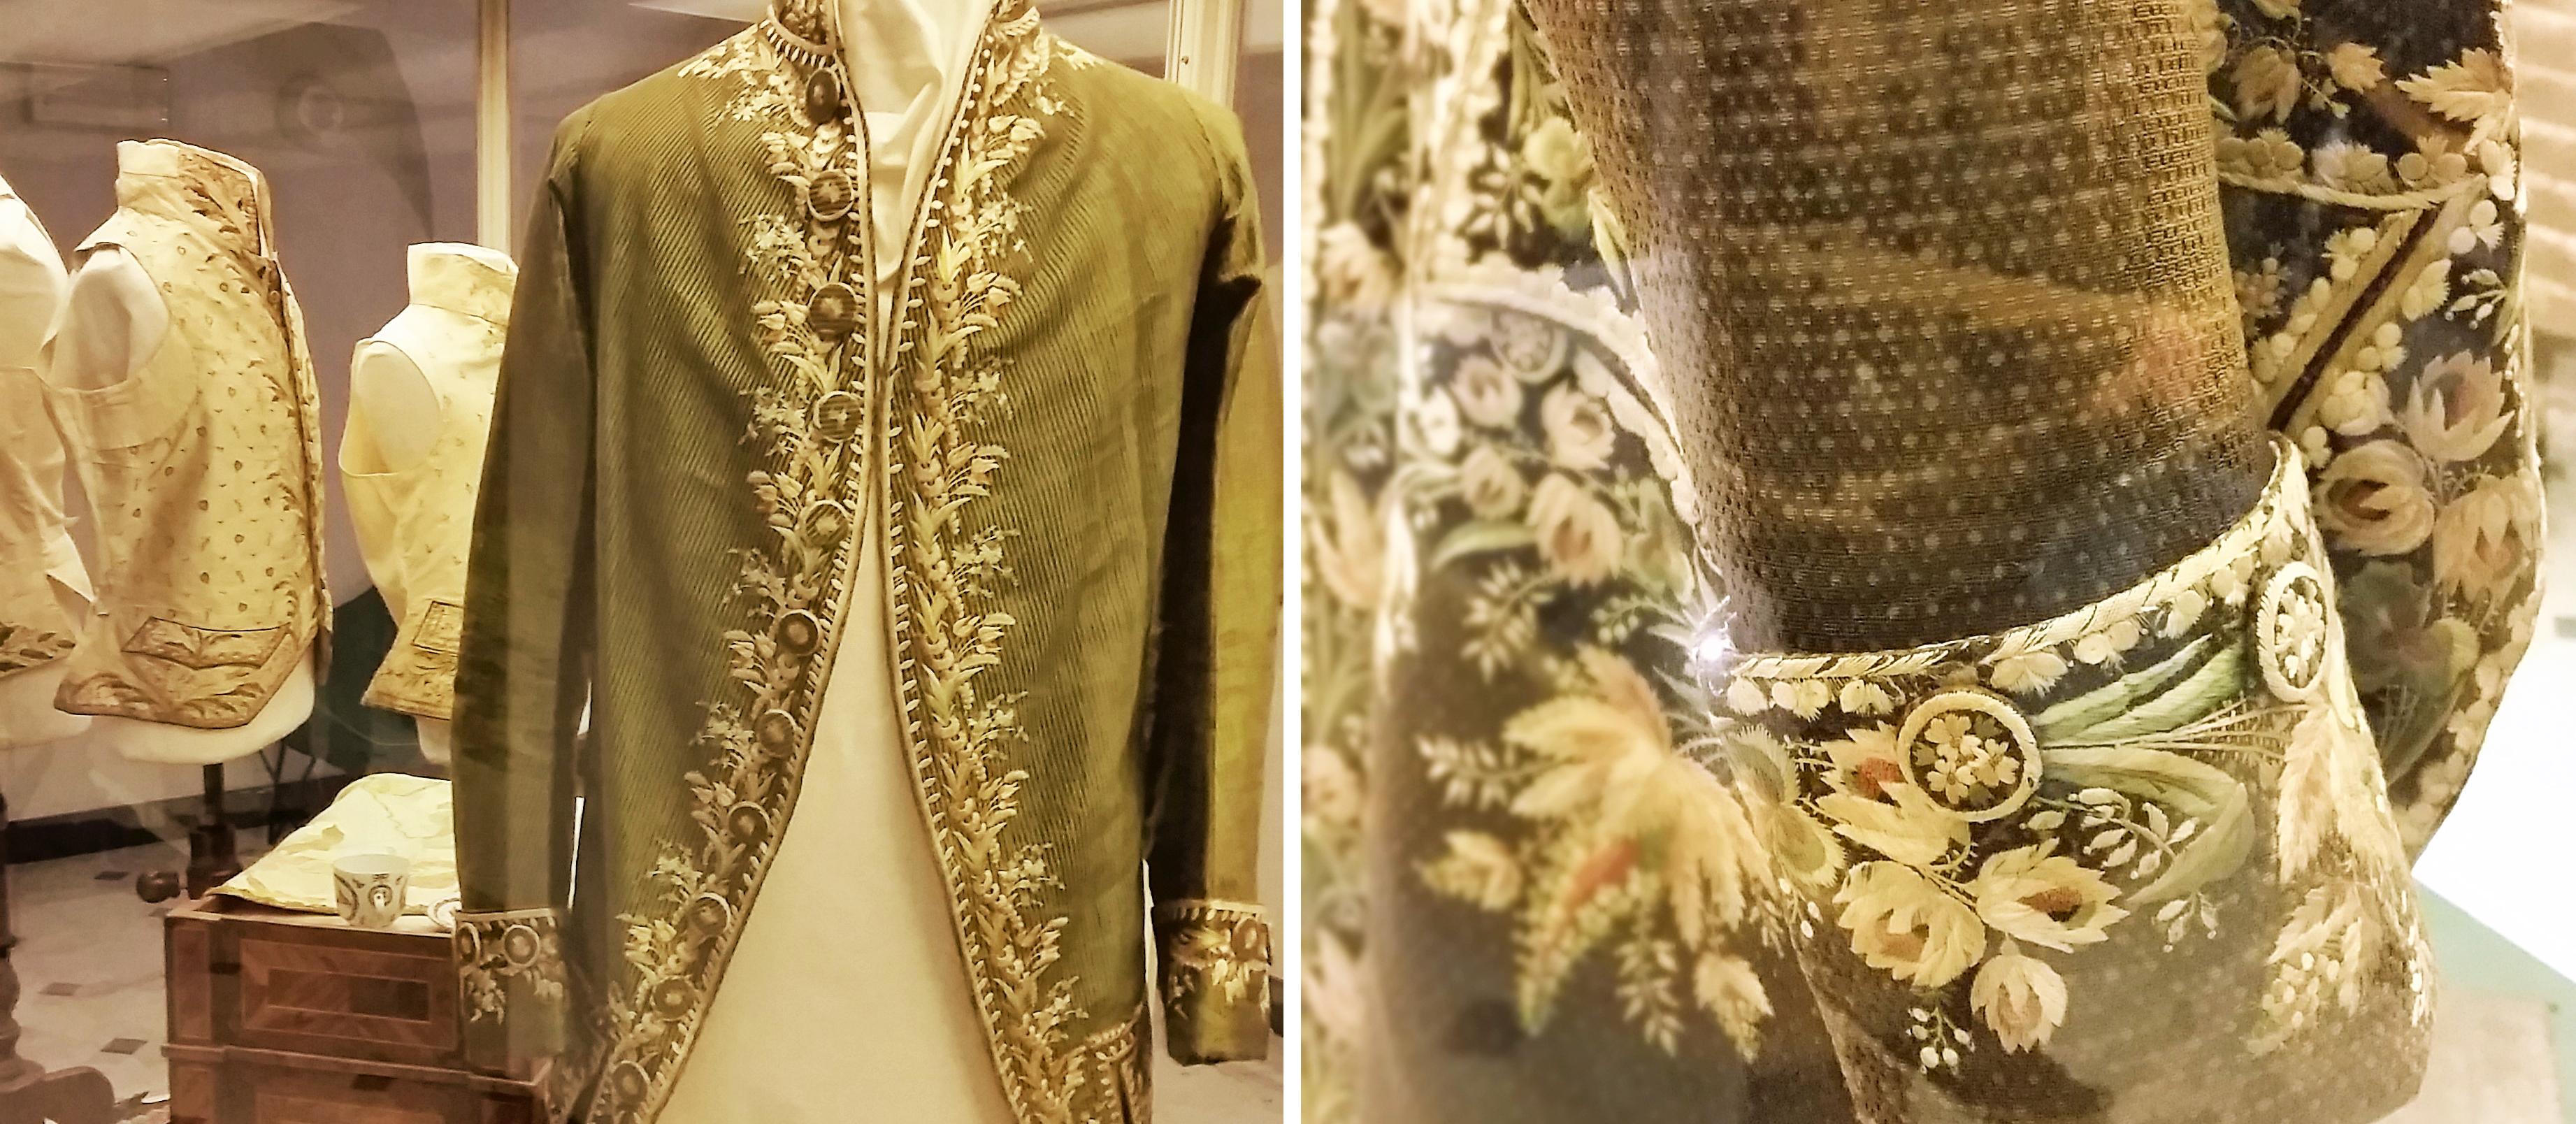 Orientalismi nella moda Settecentesca